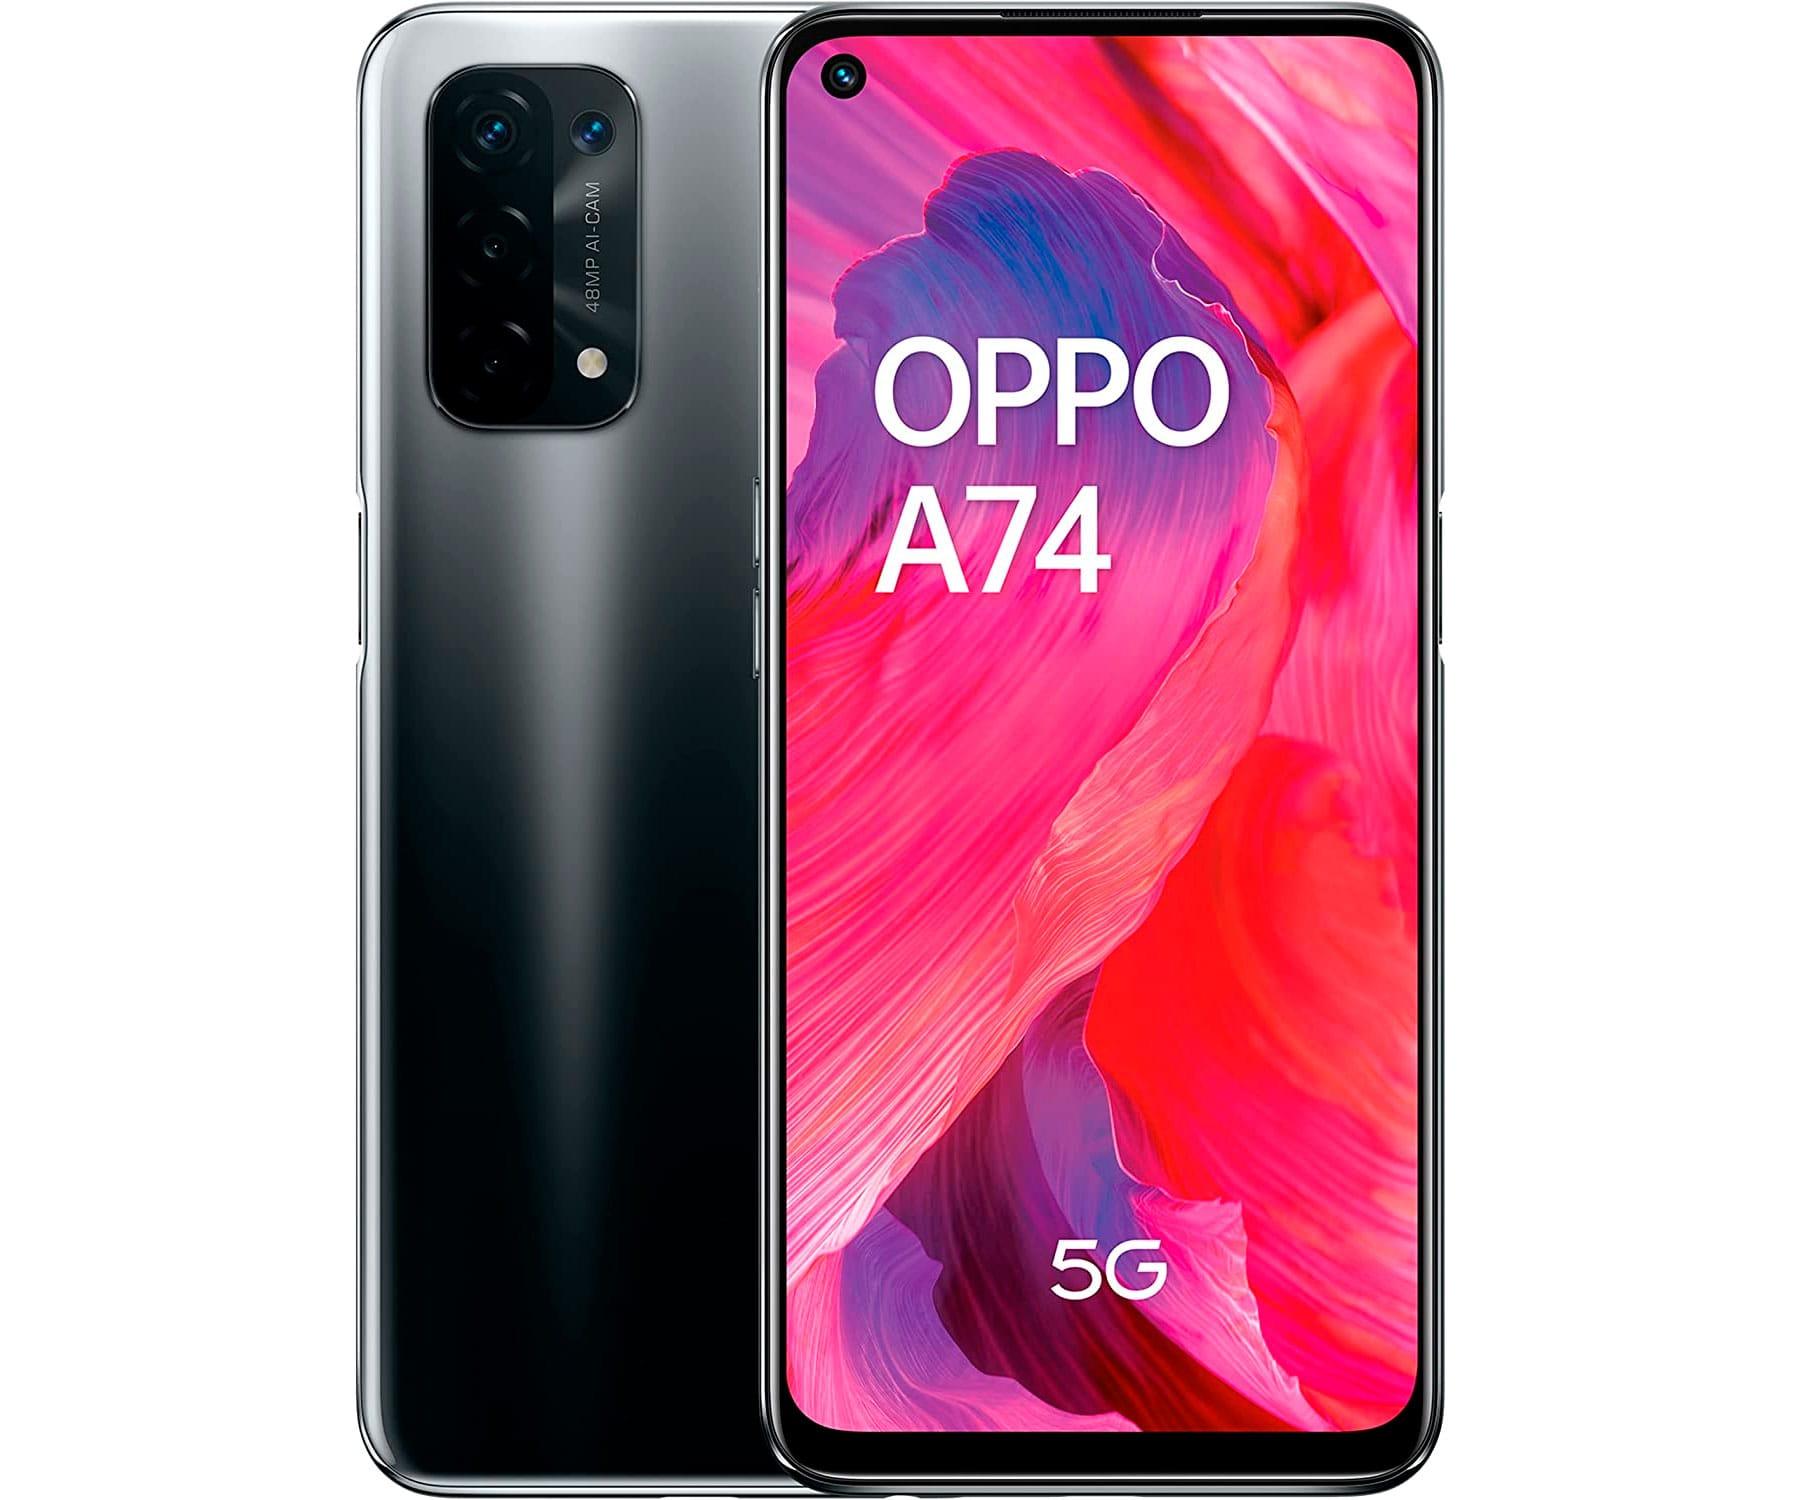 OPPO A74 5G NEGRO 8CORE/6GB/128GB/6.5'' FHD+/DUAL SIM